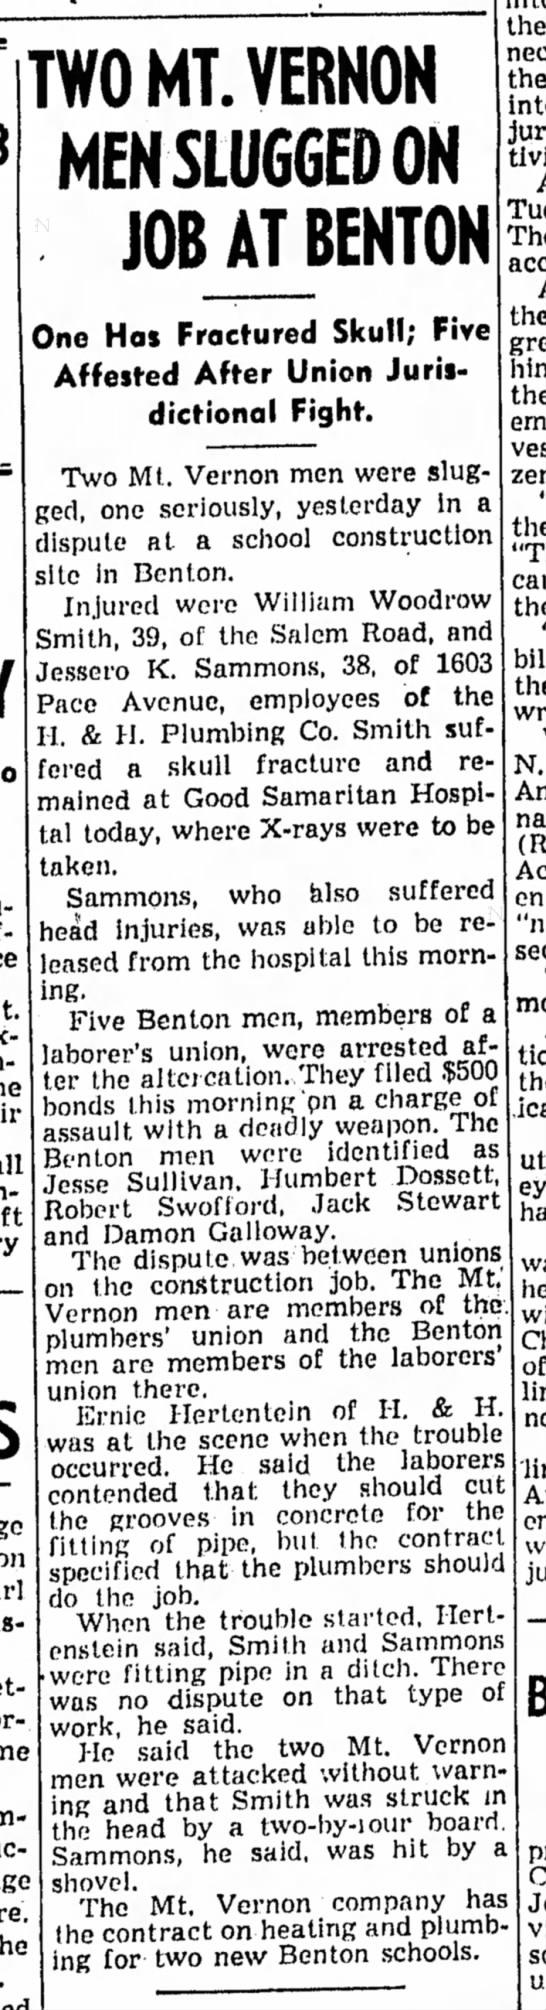 William Woodrow Smith - TWO MT. VERNON MEN SLUGGED ON JOB AT BENTON One...